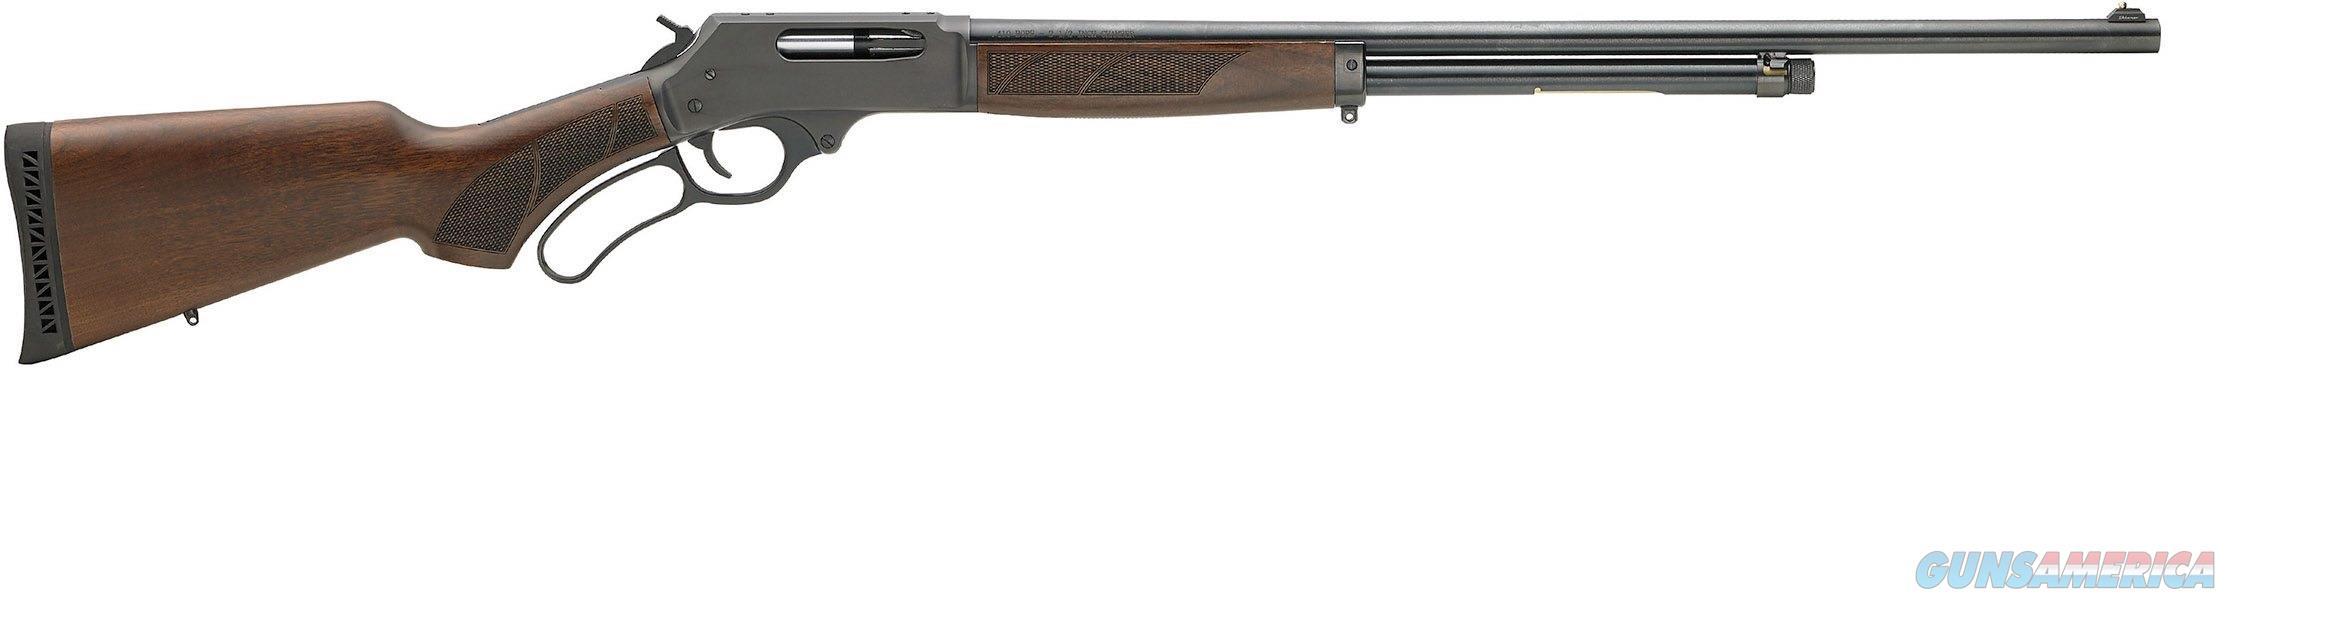 "Henry Lever Action Shotgun .410 Bore 24"" 5 Rounds H018-410   Guns > Shotguns > H Misc Shotguns"